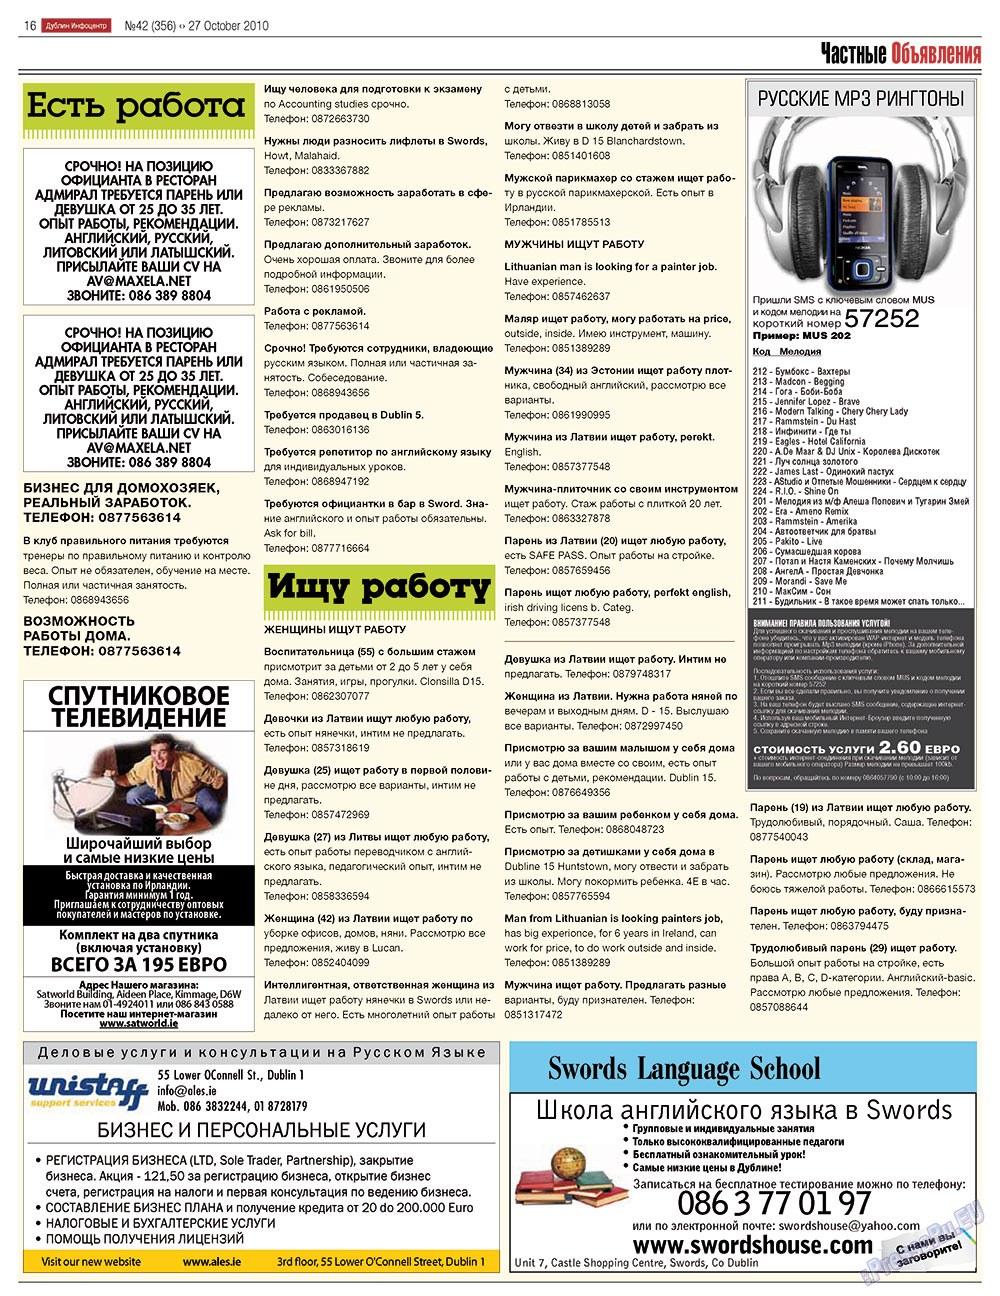 Дублин инфоцентр (газета). 2010 год, номер 42, стр. 16